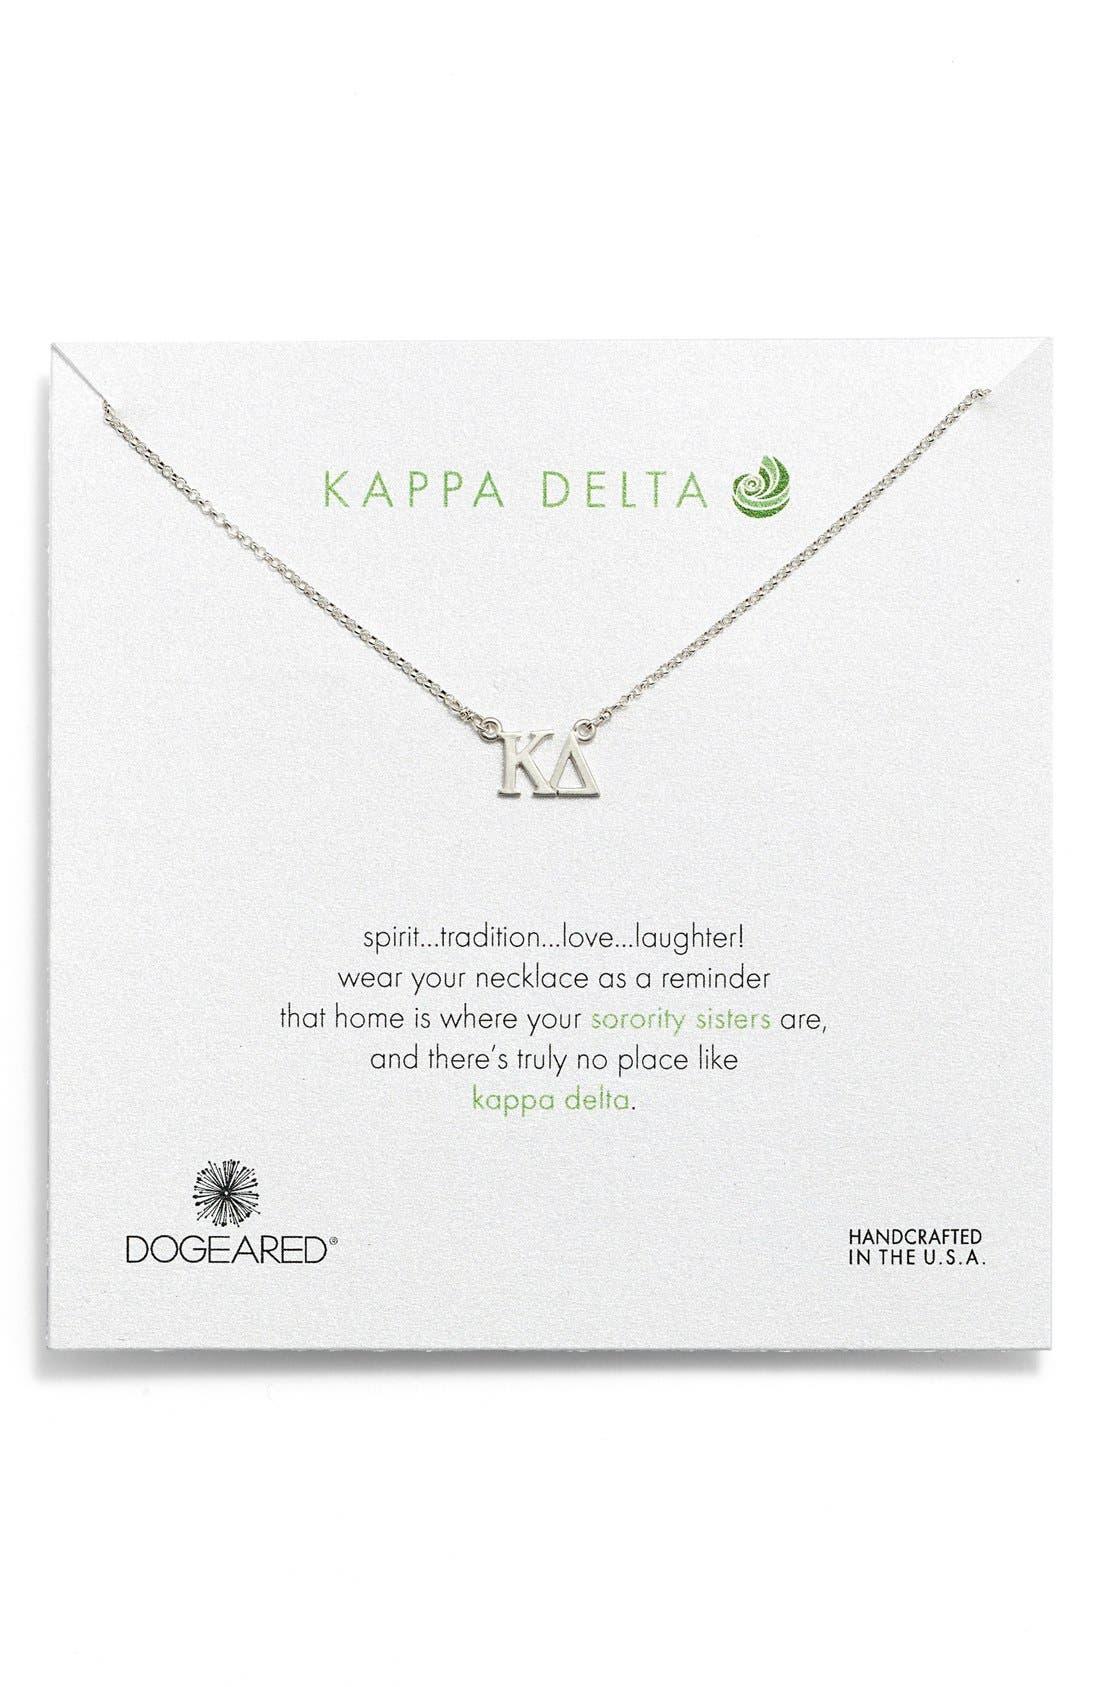 Dogeared 'Kappa Delta' Pendant Necklace